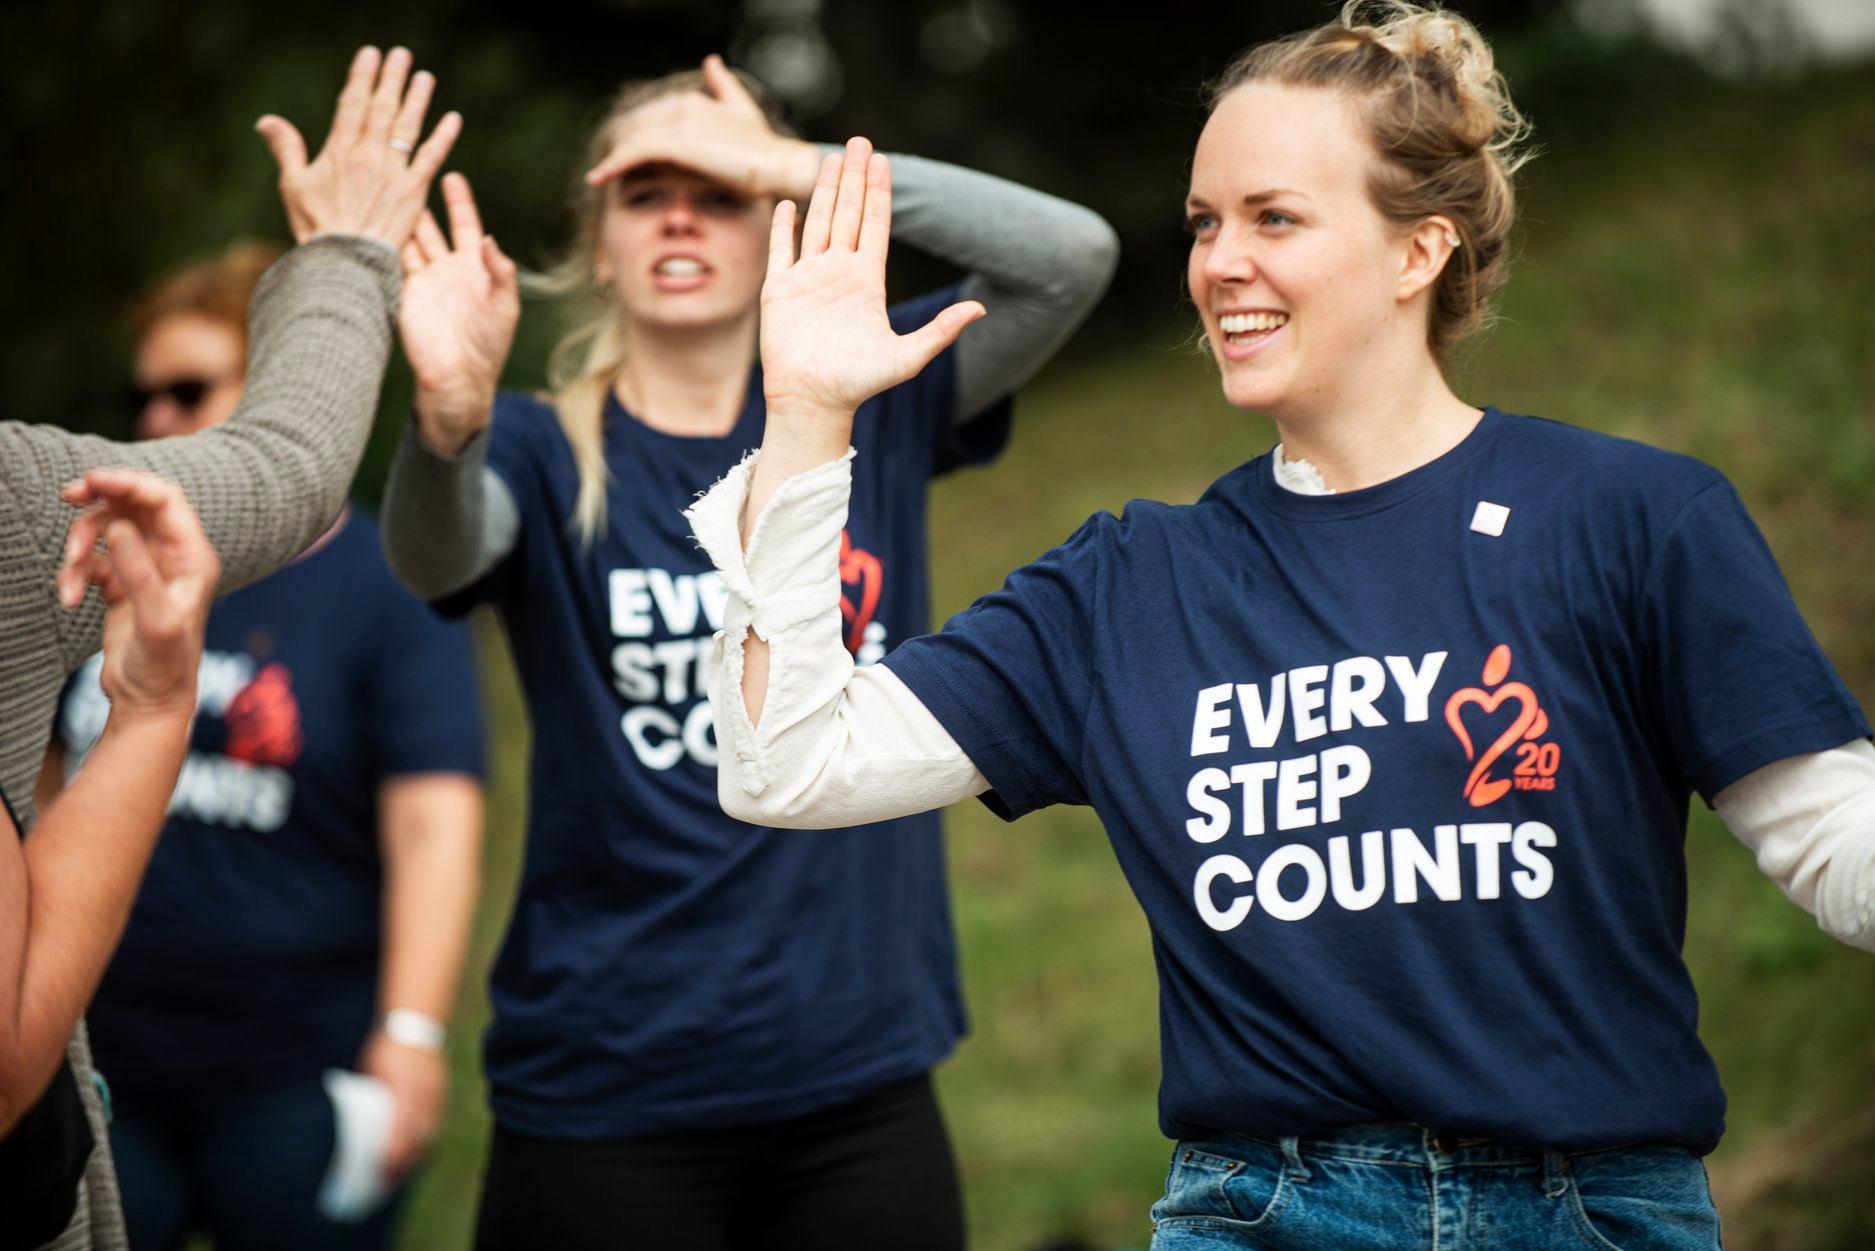 Walkathon participants giving high-fives.